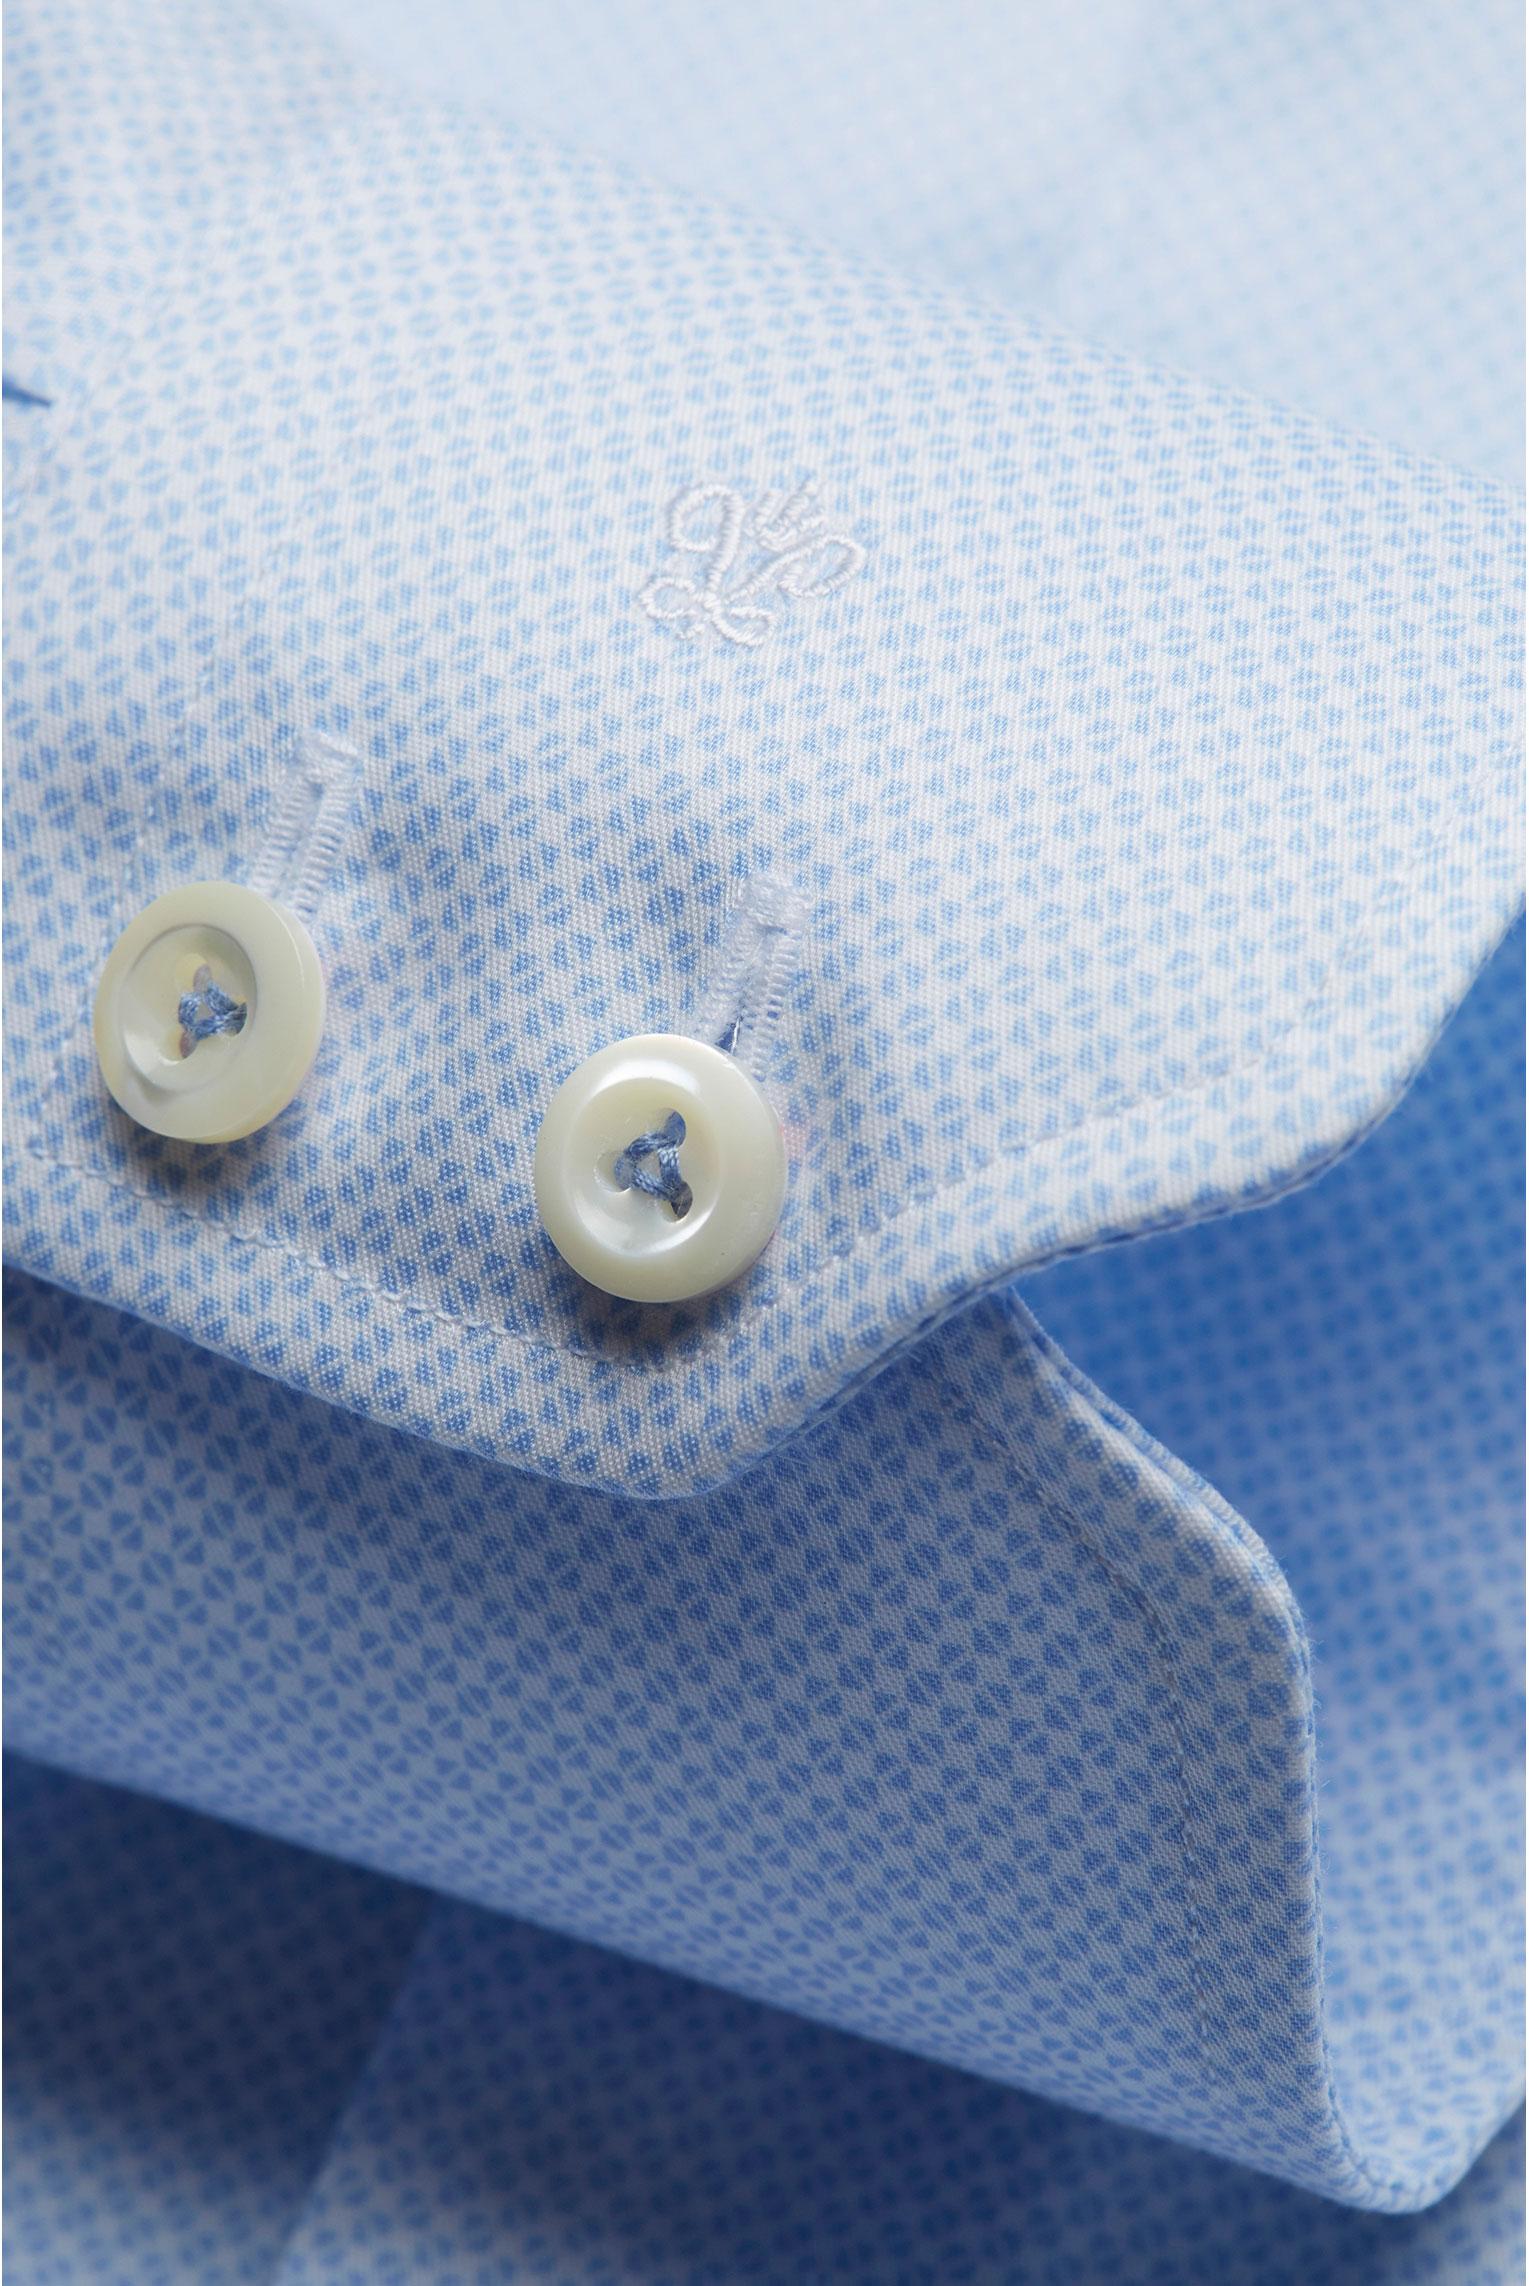 Business Shirts+RET-POSFN-M+35.3032.C8.171587.720.41